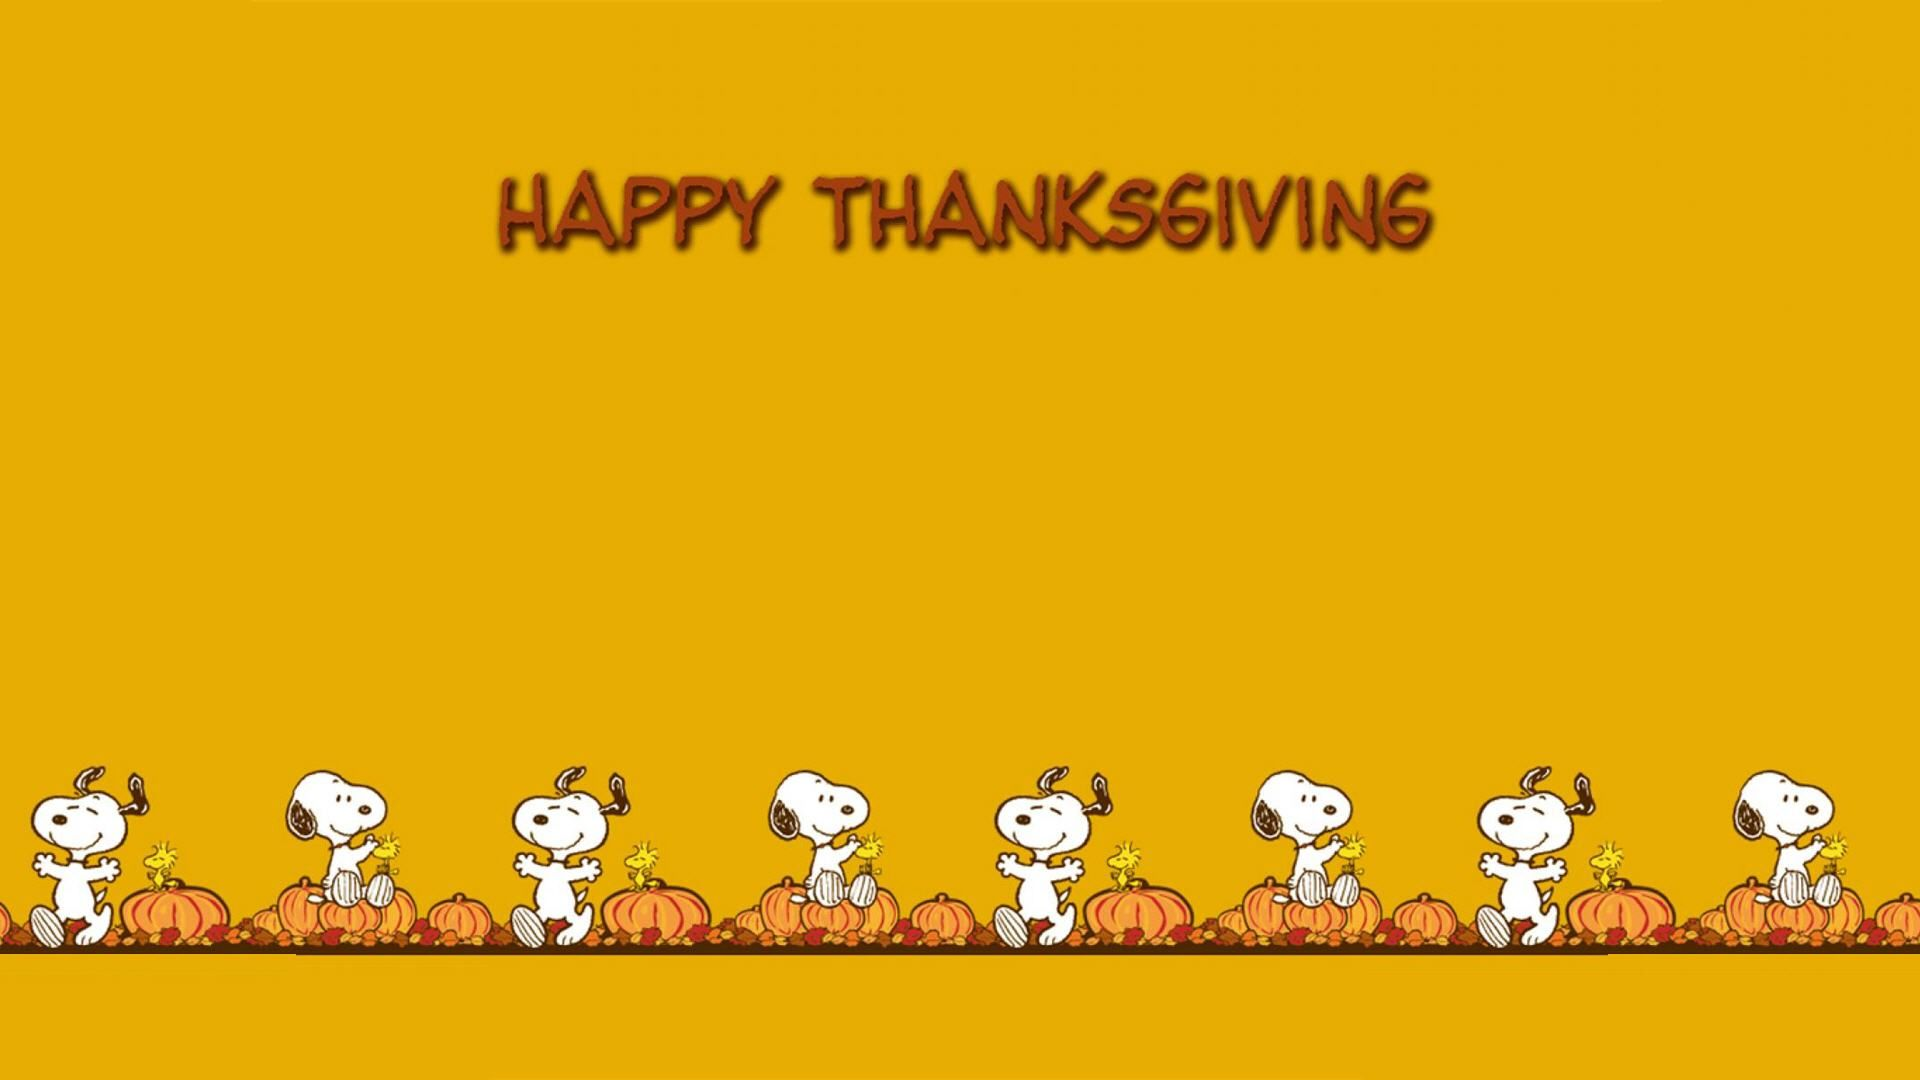 Most Inspiring Wallpaper High Resolution Thanksgiving - 222ab9daa3383b555f538bfcb3dc366a  Graphic_204635.jpg